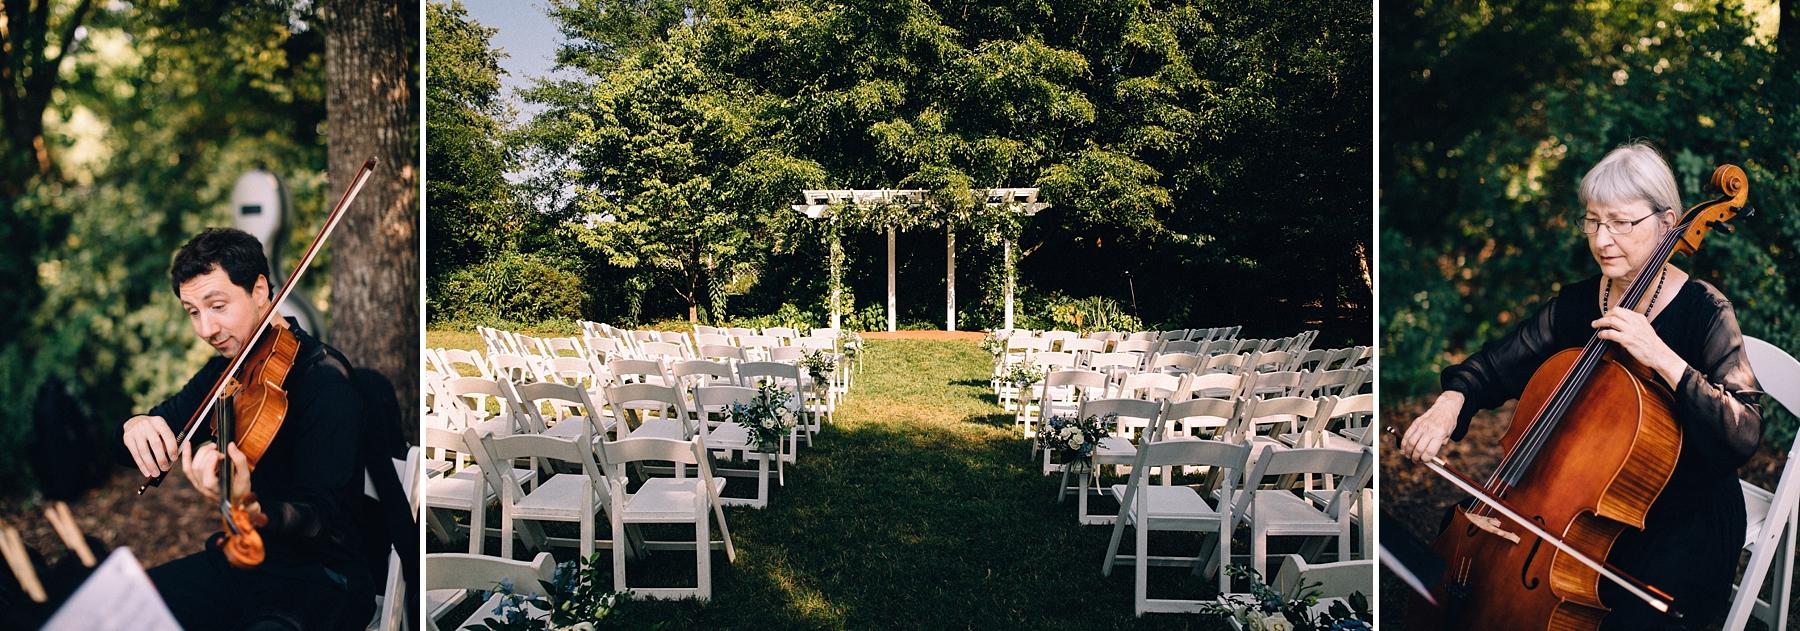 north-carolina-fearrington-village-wedding-photographer-destination_0076.jpg